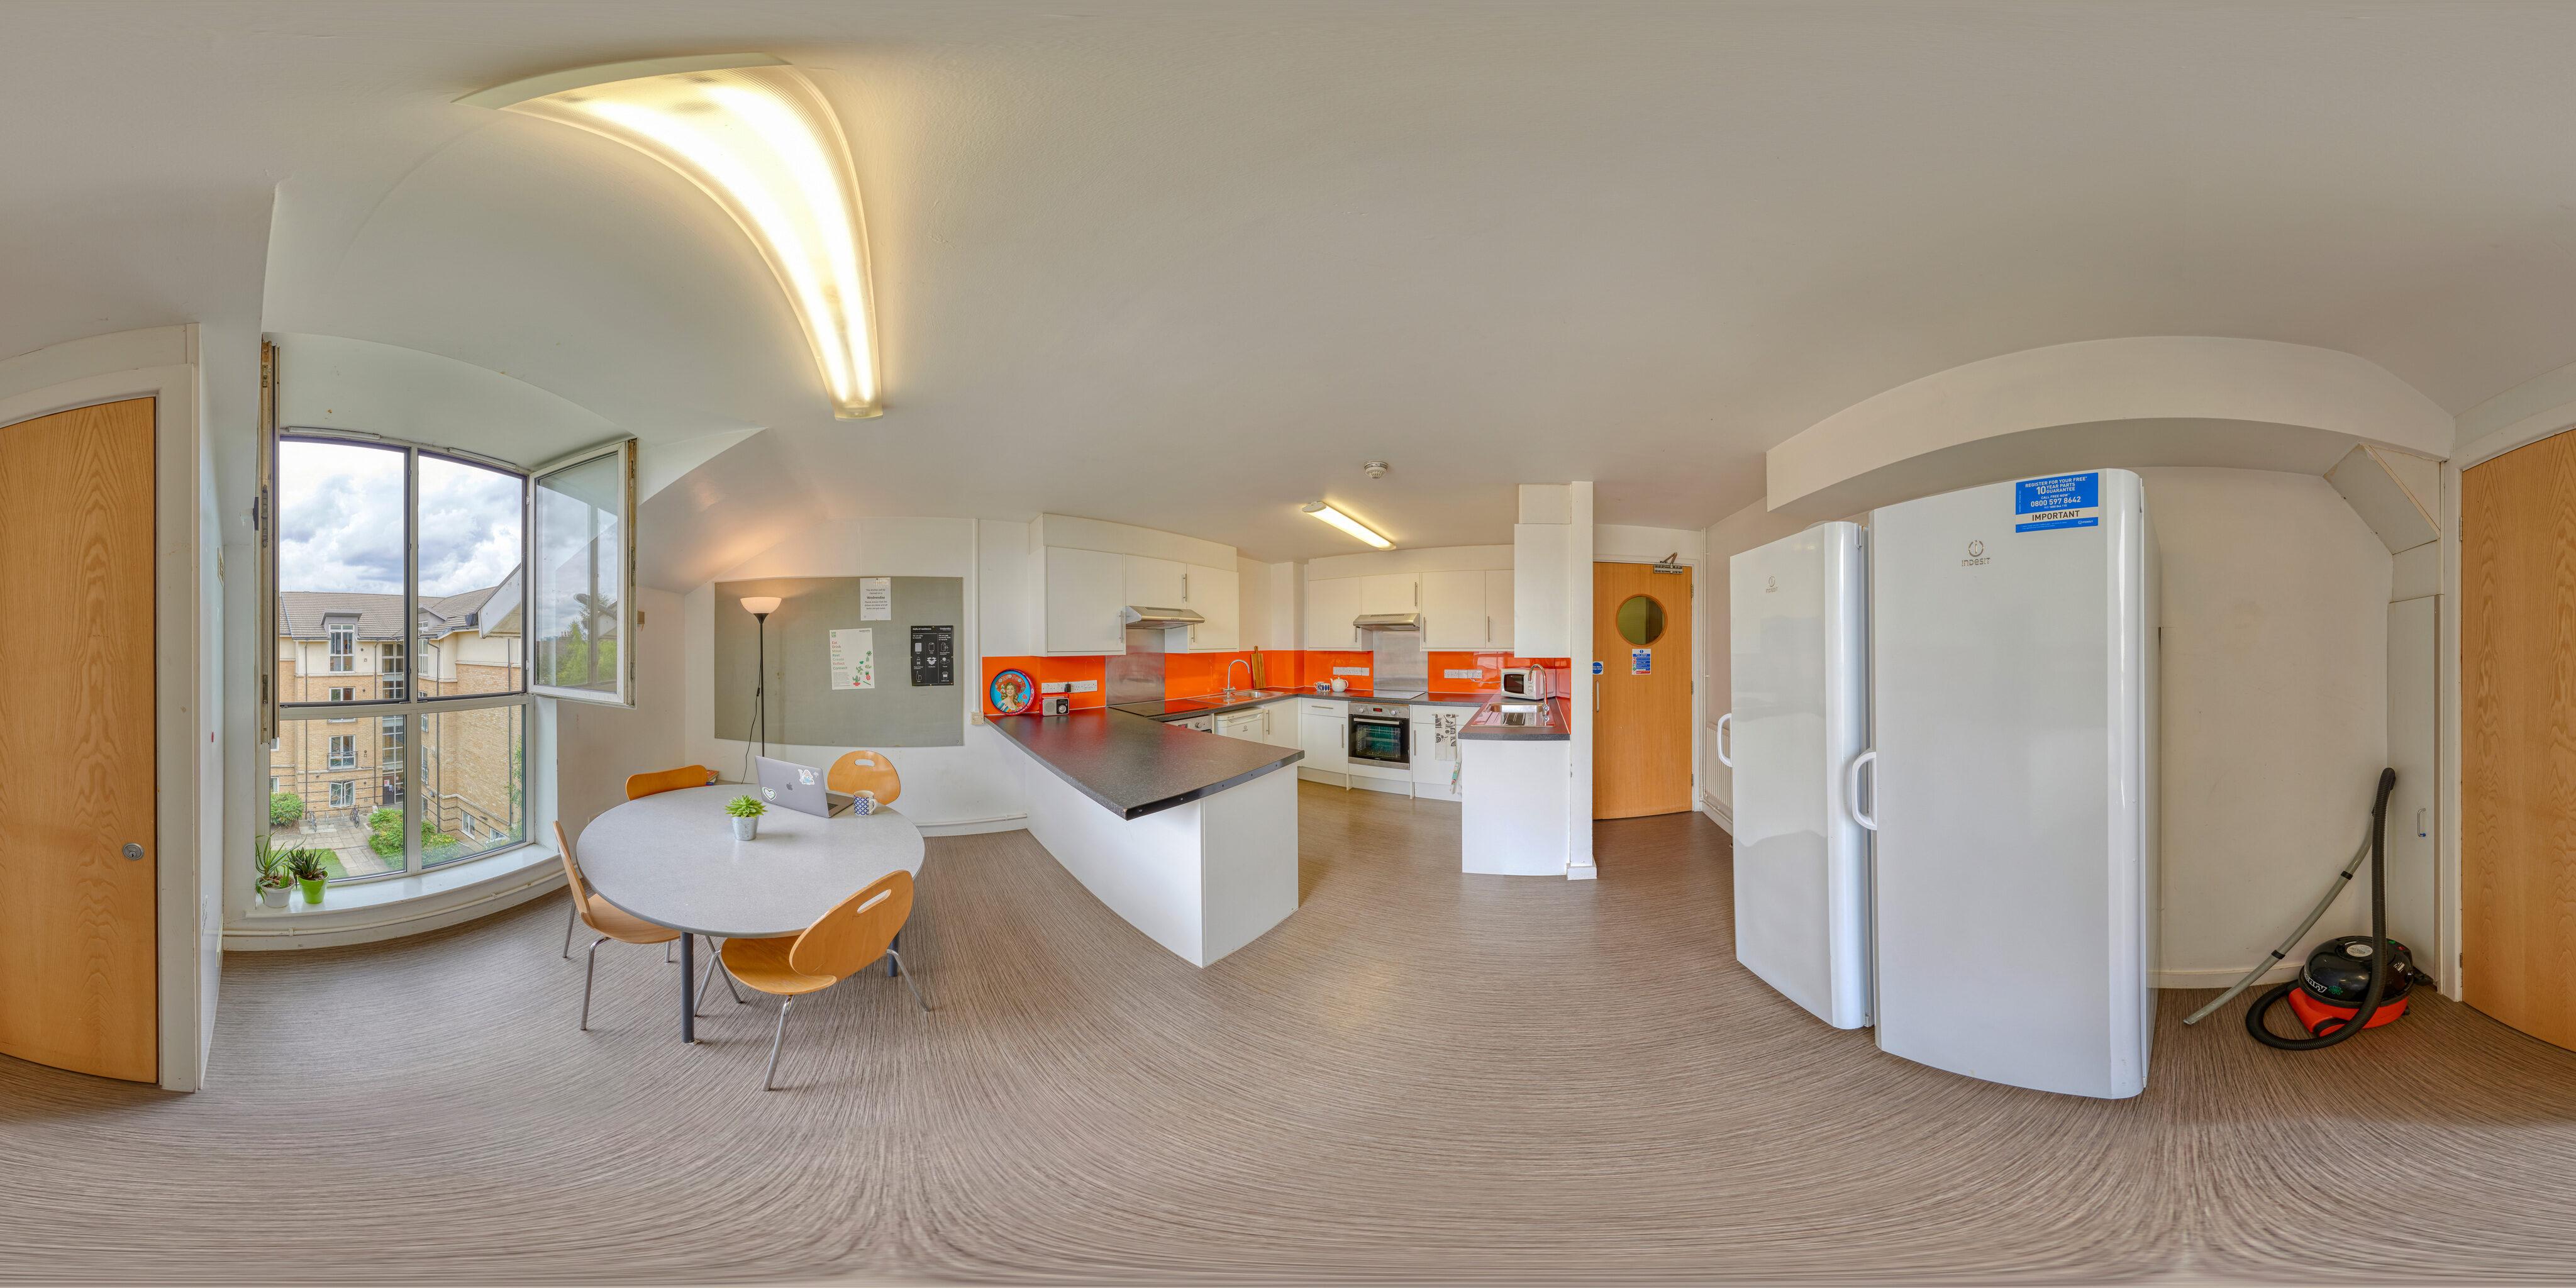 360 of Accommodation Kitchen